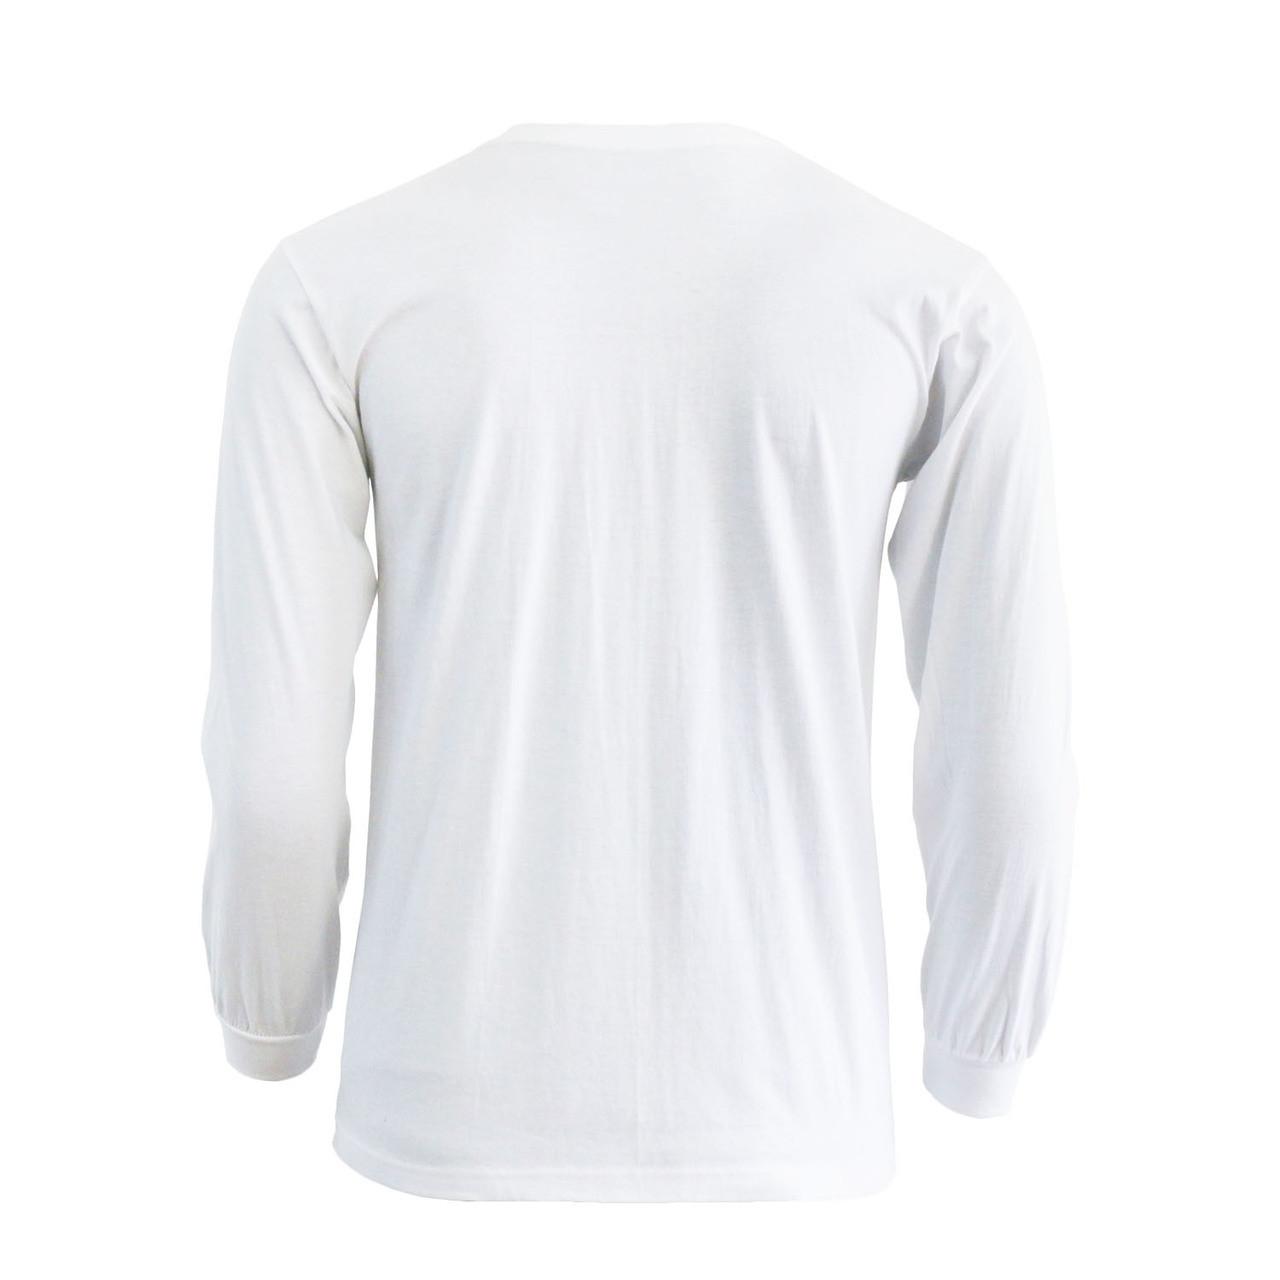 56e5d0528c23 Bcpolo White Round T-shirt Crew Neck long sleeves Cotton T-Shirt